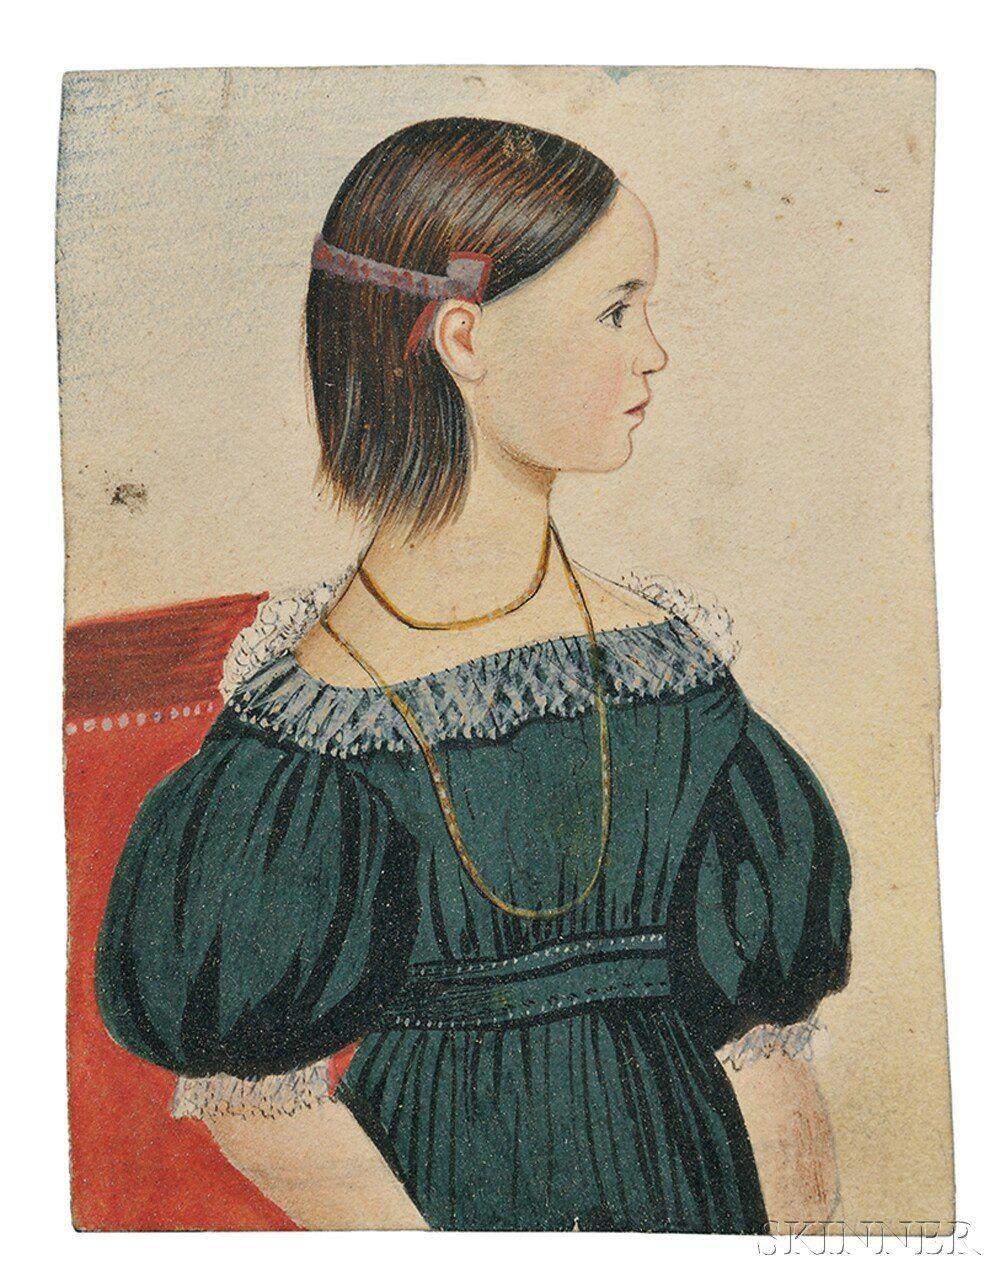 Edwin Plummer (Massachusetts, c. 1802-1880) Four Portraits of Children. | Sale Number 2744M, Lot Number 453 | Skinner Auctioneers